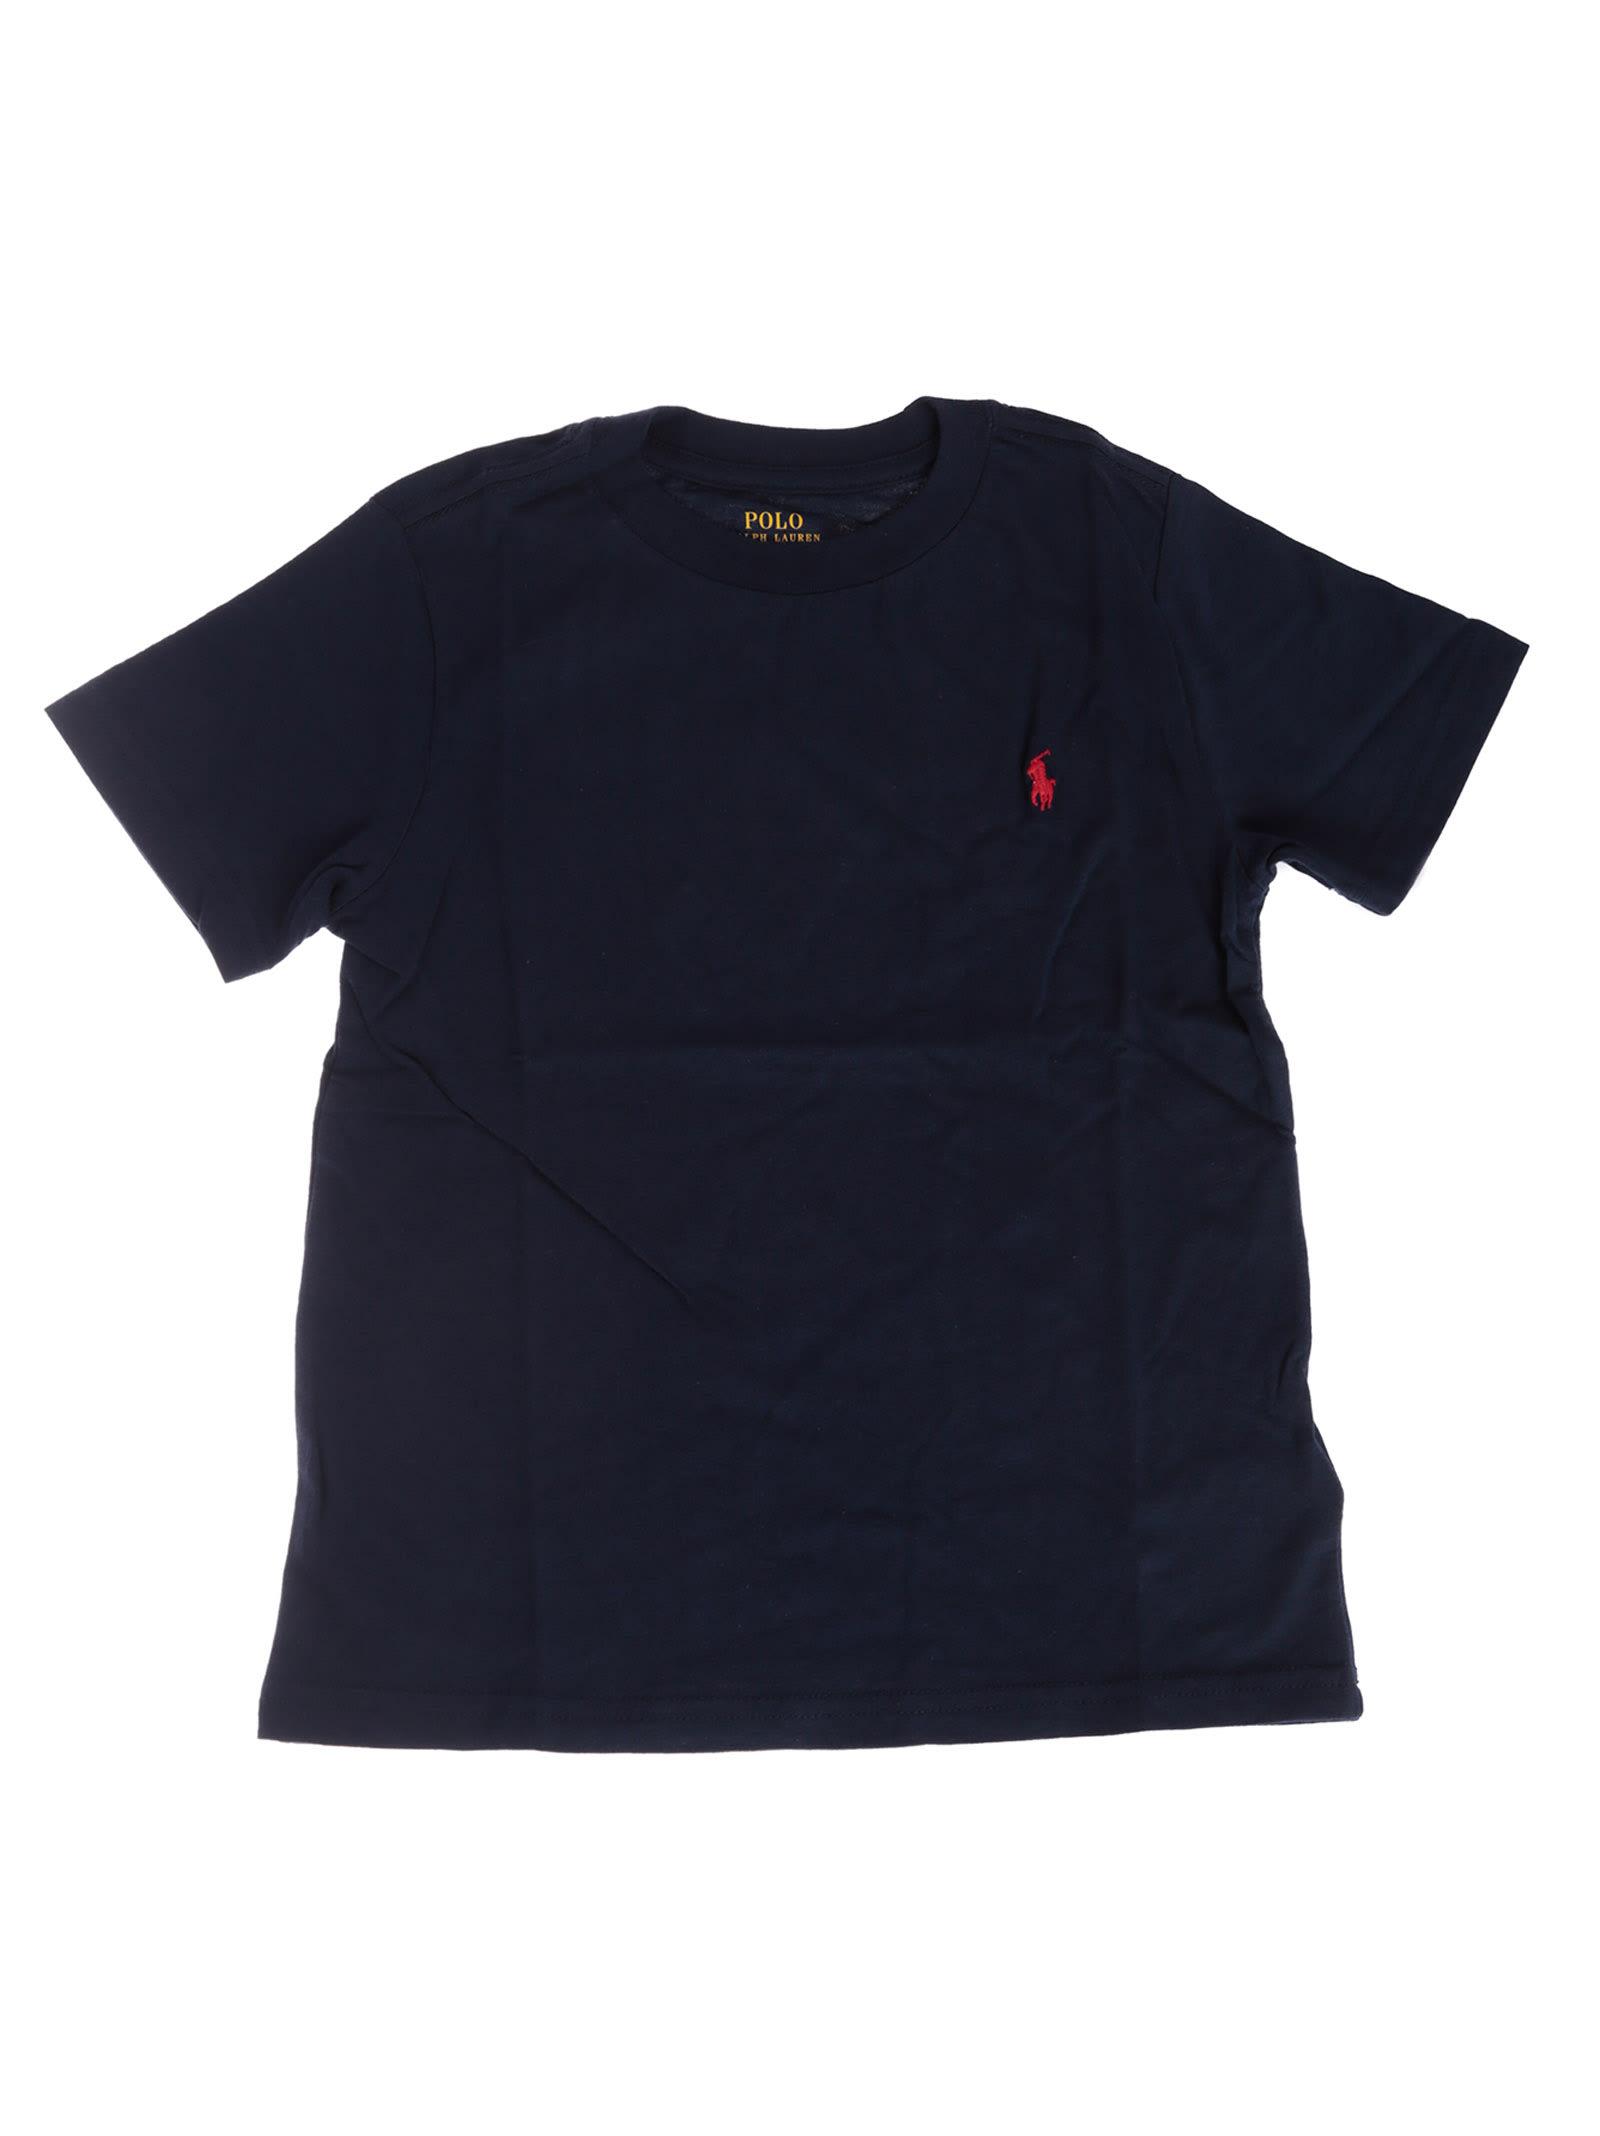 Round T Ralph Lauren Neck Shirt 10955945 Polo trsQChd